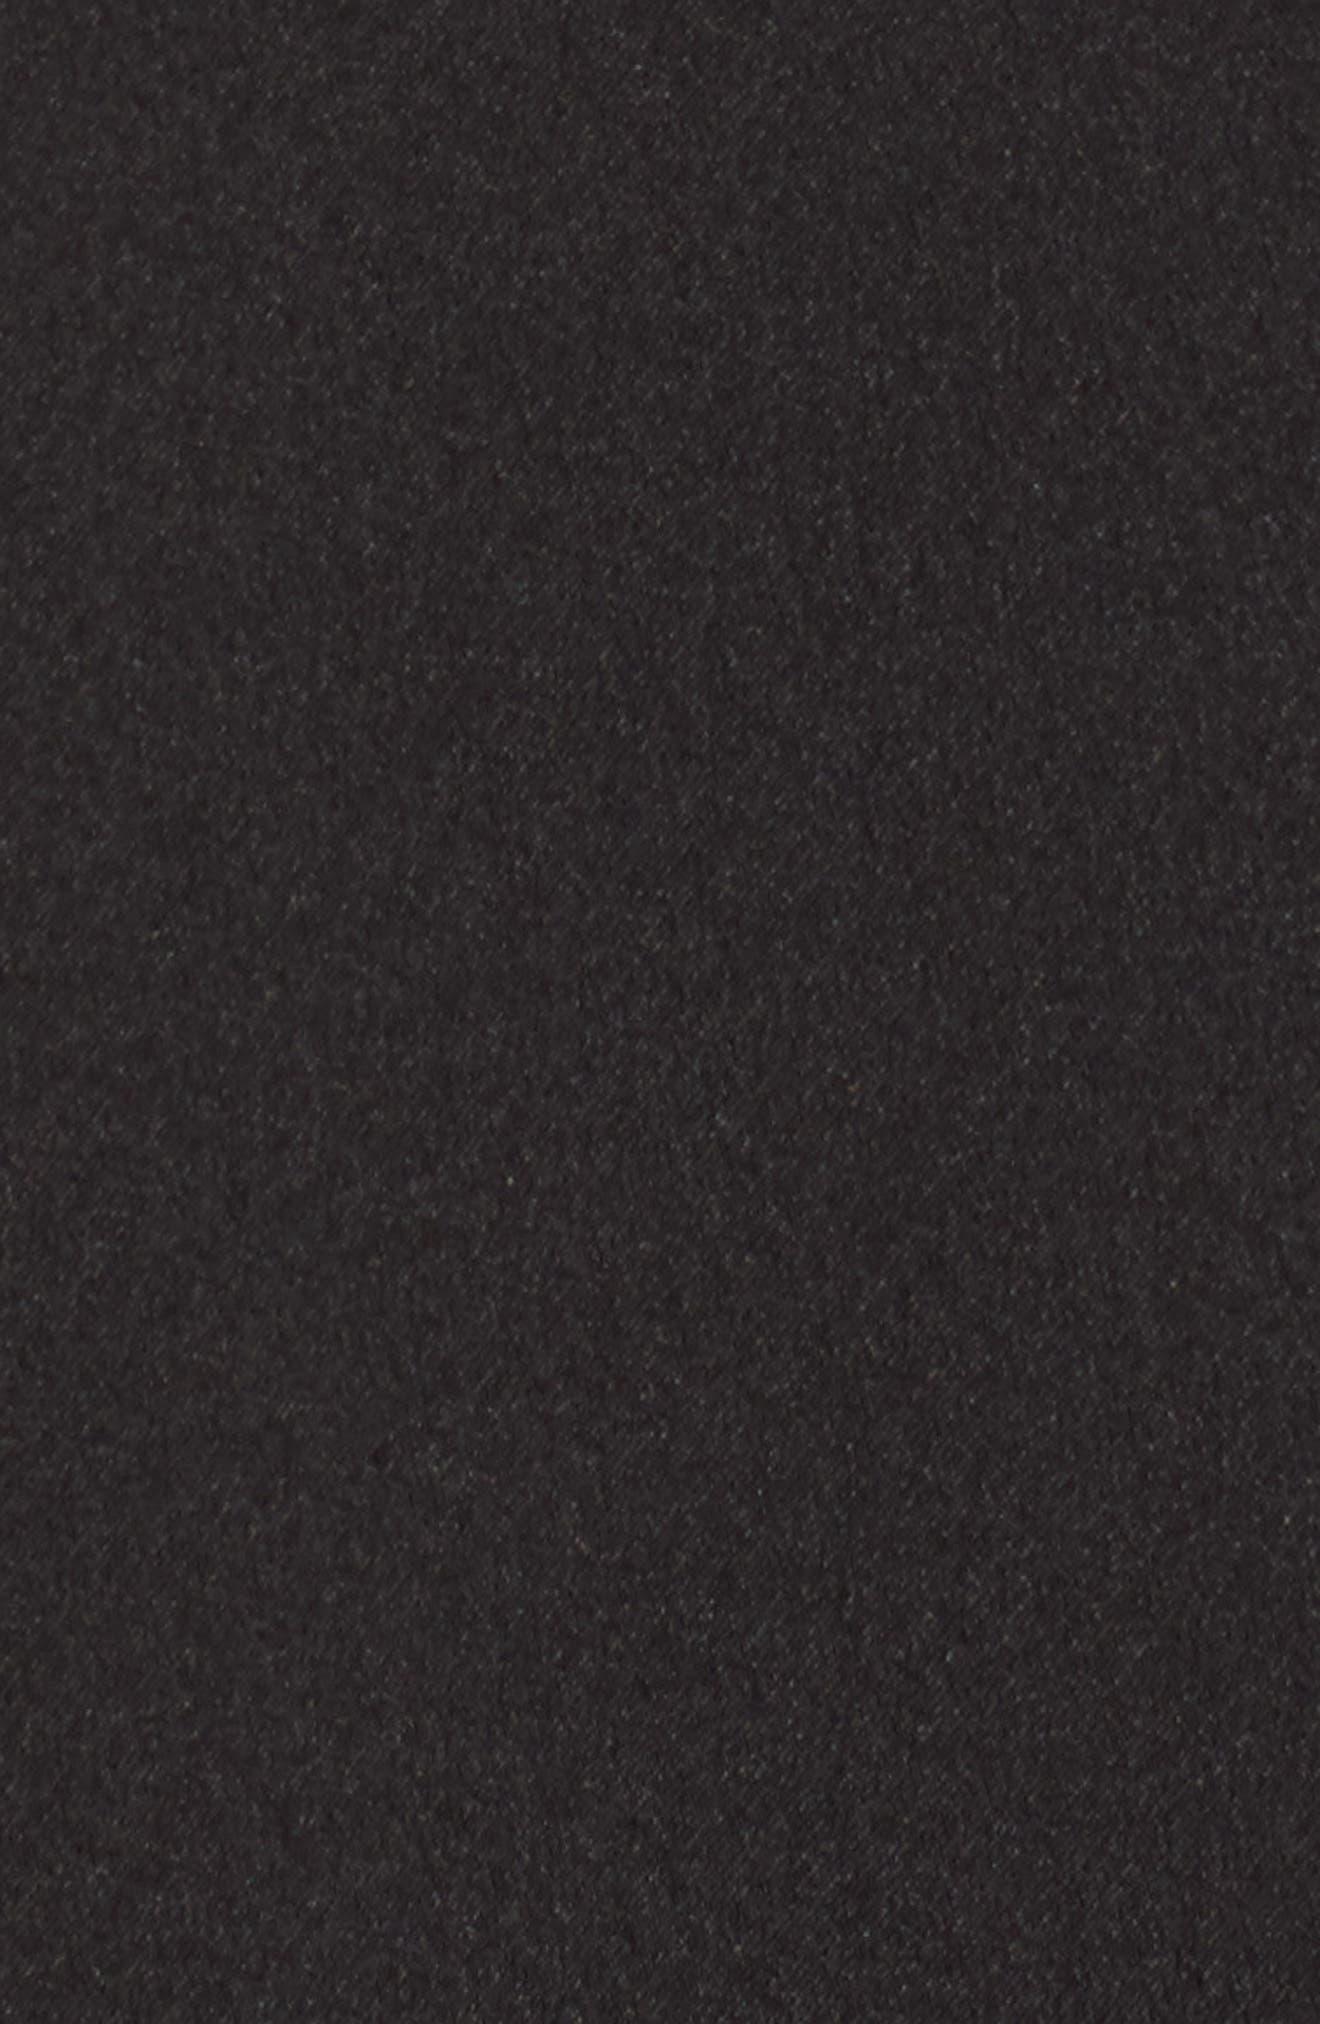 Short Sleeve Ruffle Hem Dress,                             Alternate thumbnail 6, color,                             001